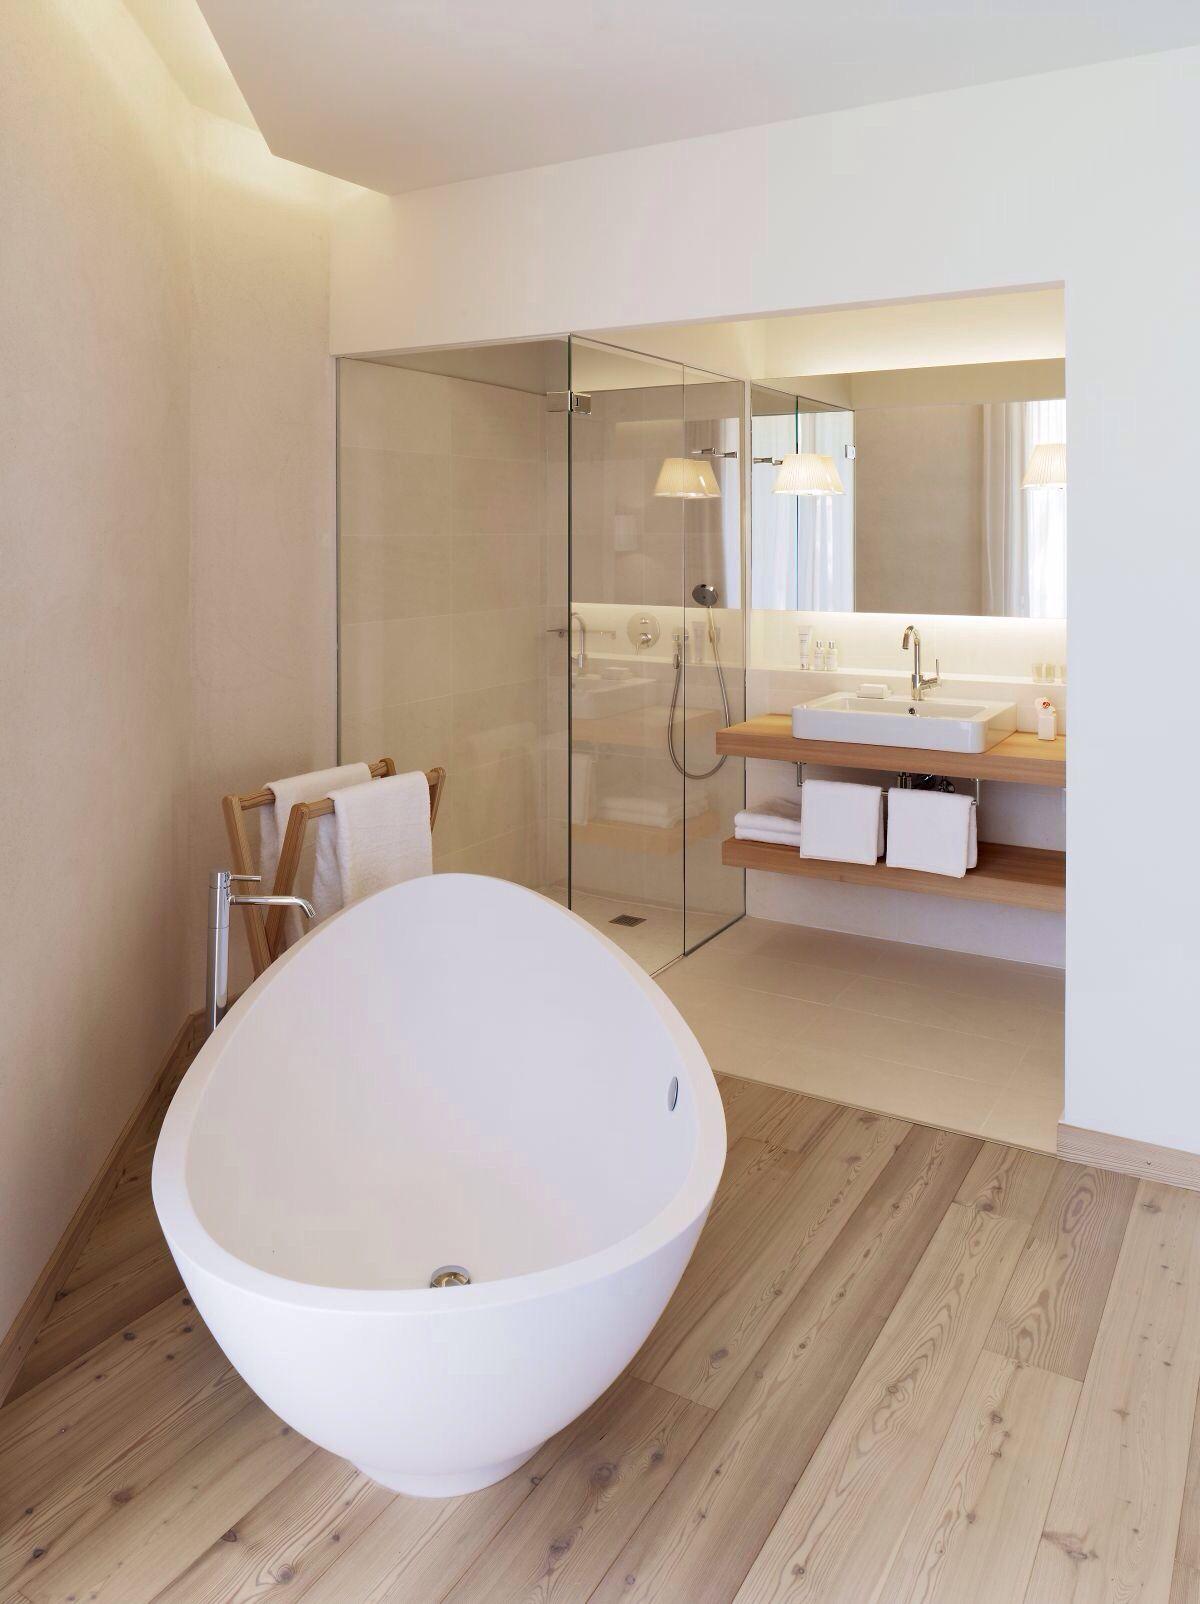 Open Plan Bathroom Modern Small Bathrooms Bathroom Design Small Modern Bathroom Design